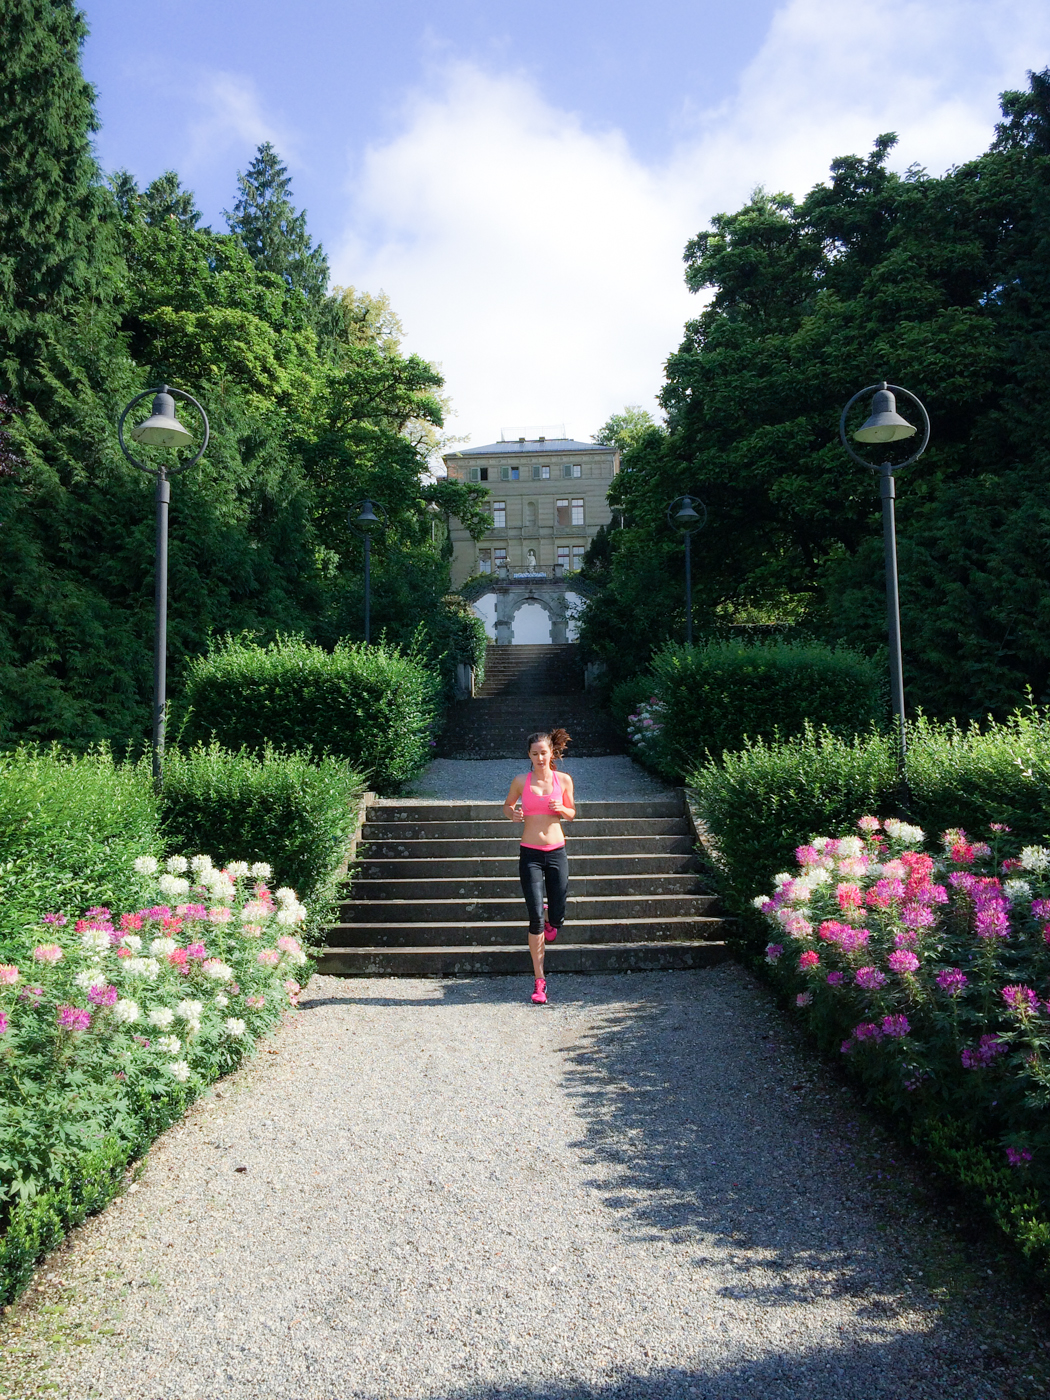 Lindarella-Linda-Urlaub-Bodensee-Travelblog-0101